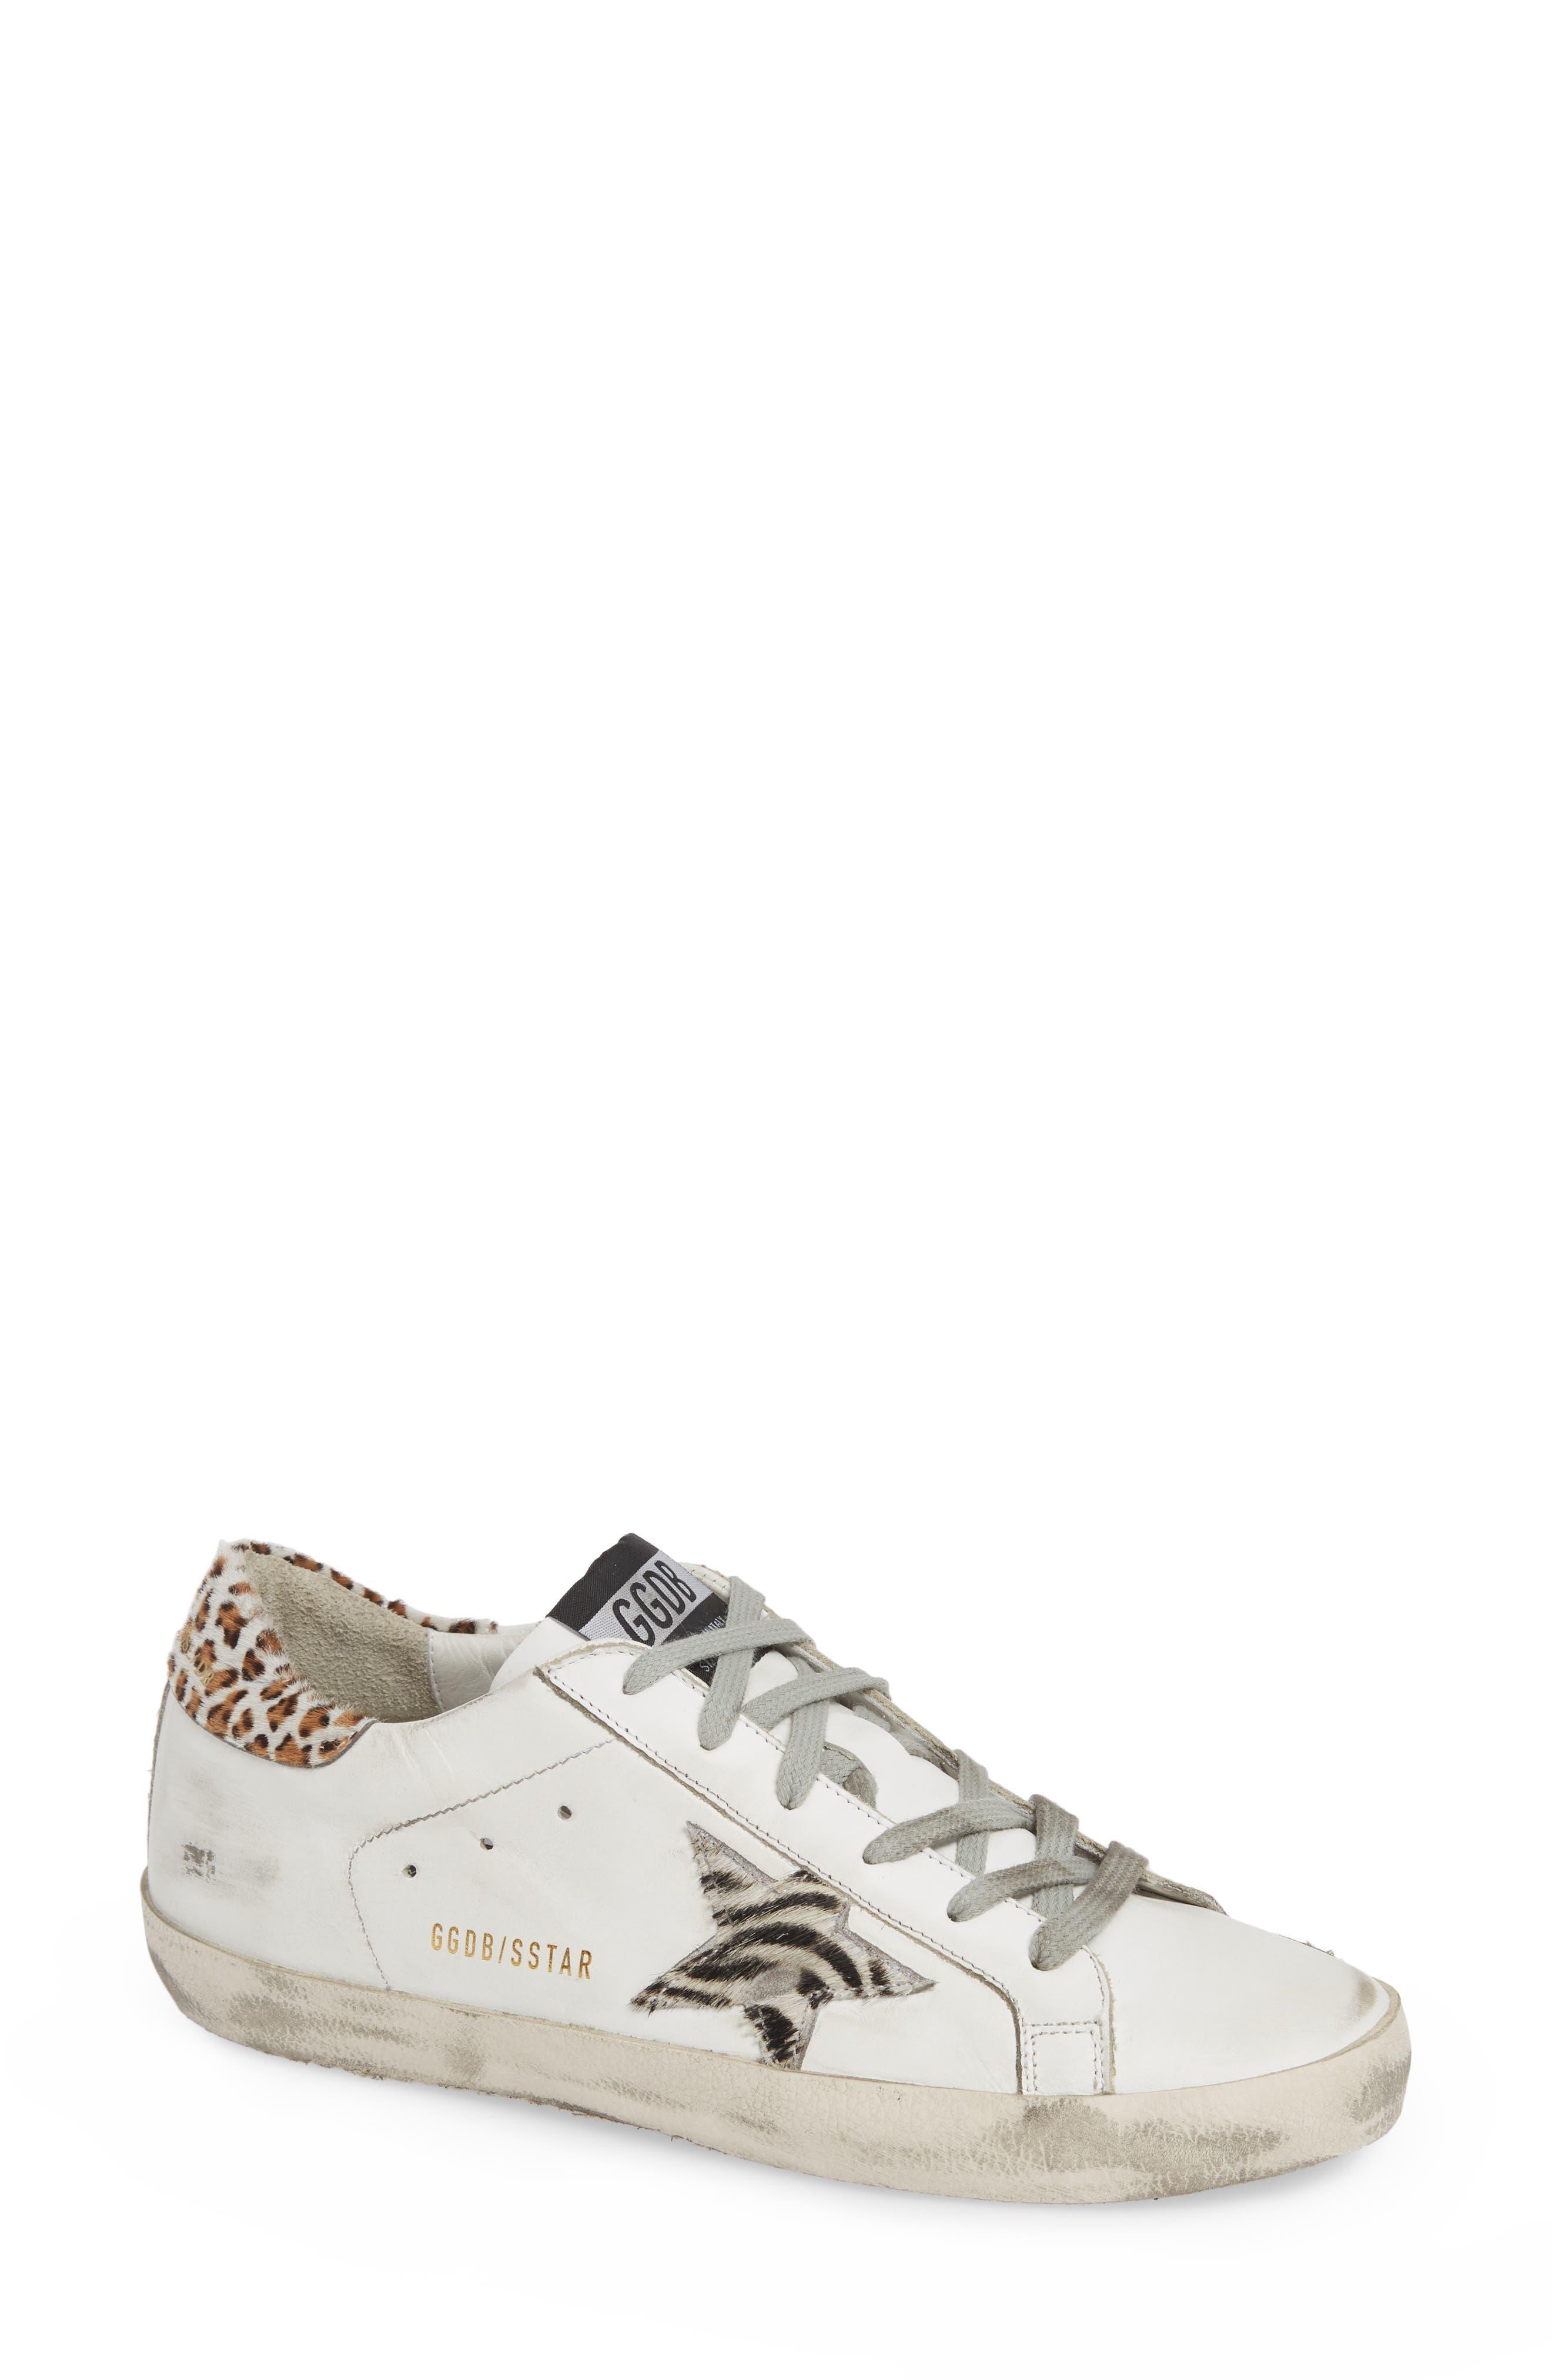 Superstar Genuine Calf Hair Sneaker,                         Main,                         color, WHITE/ ZEBRA